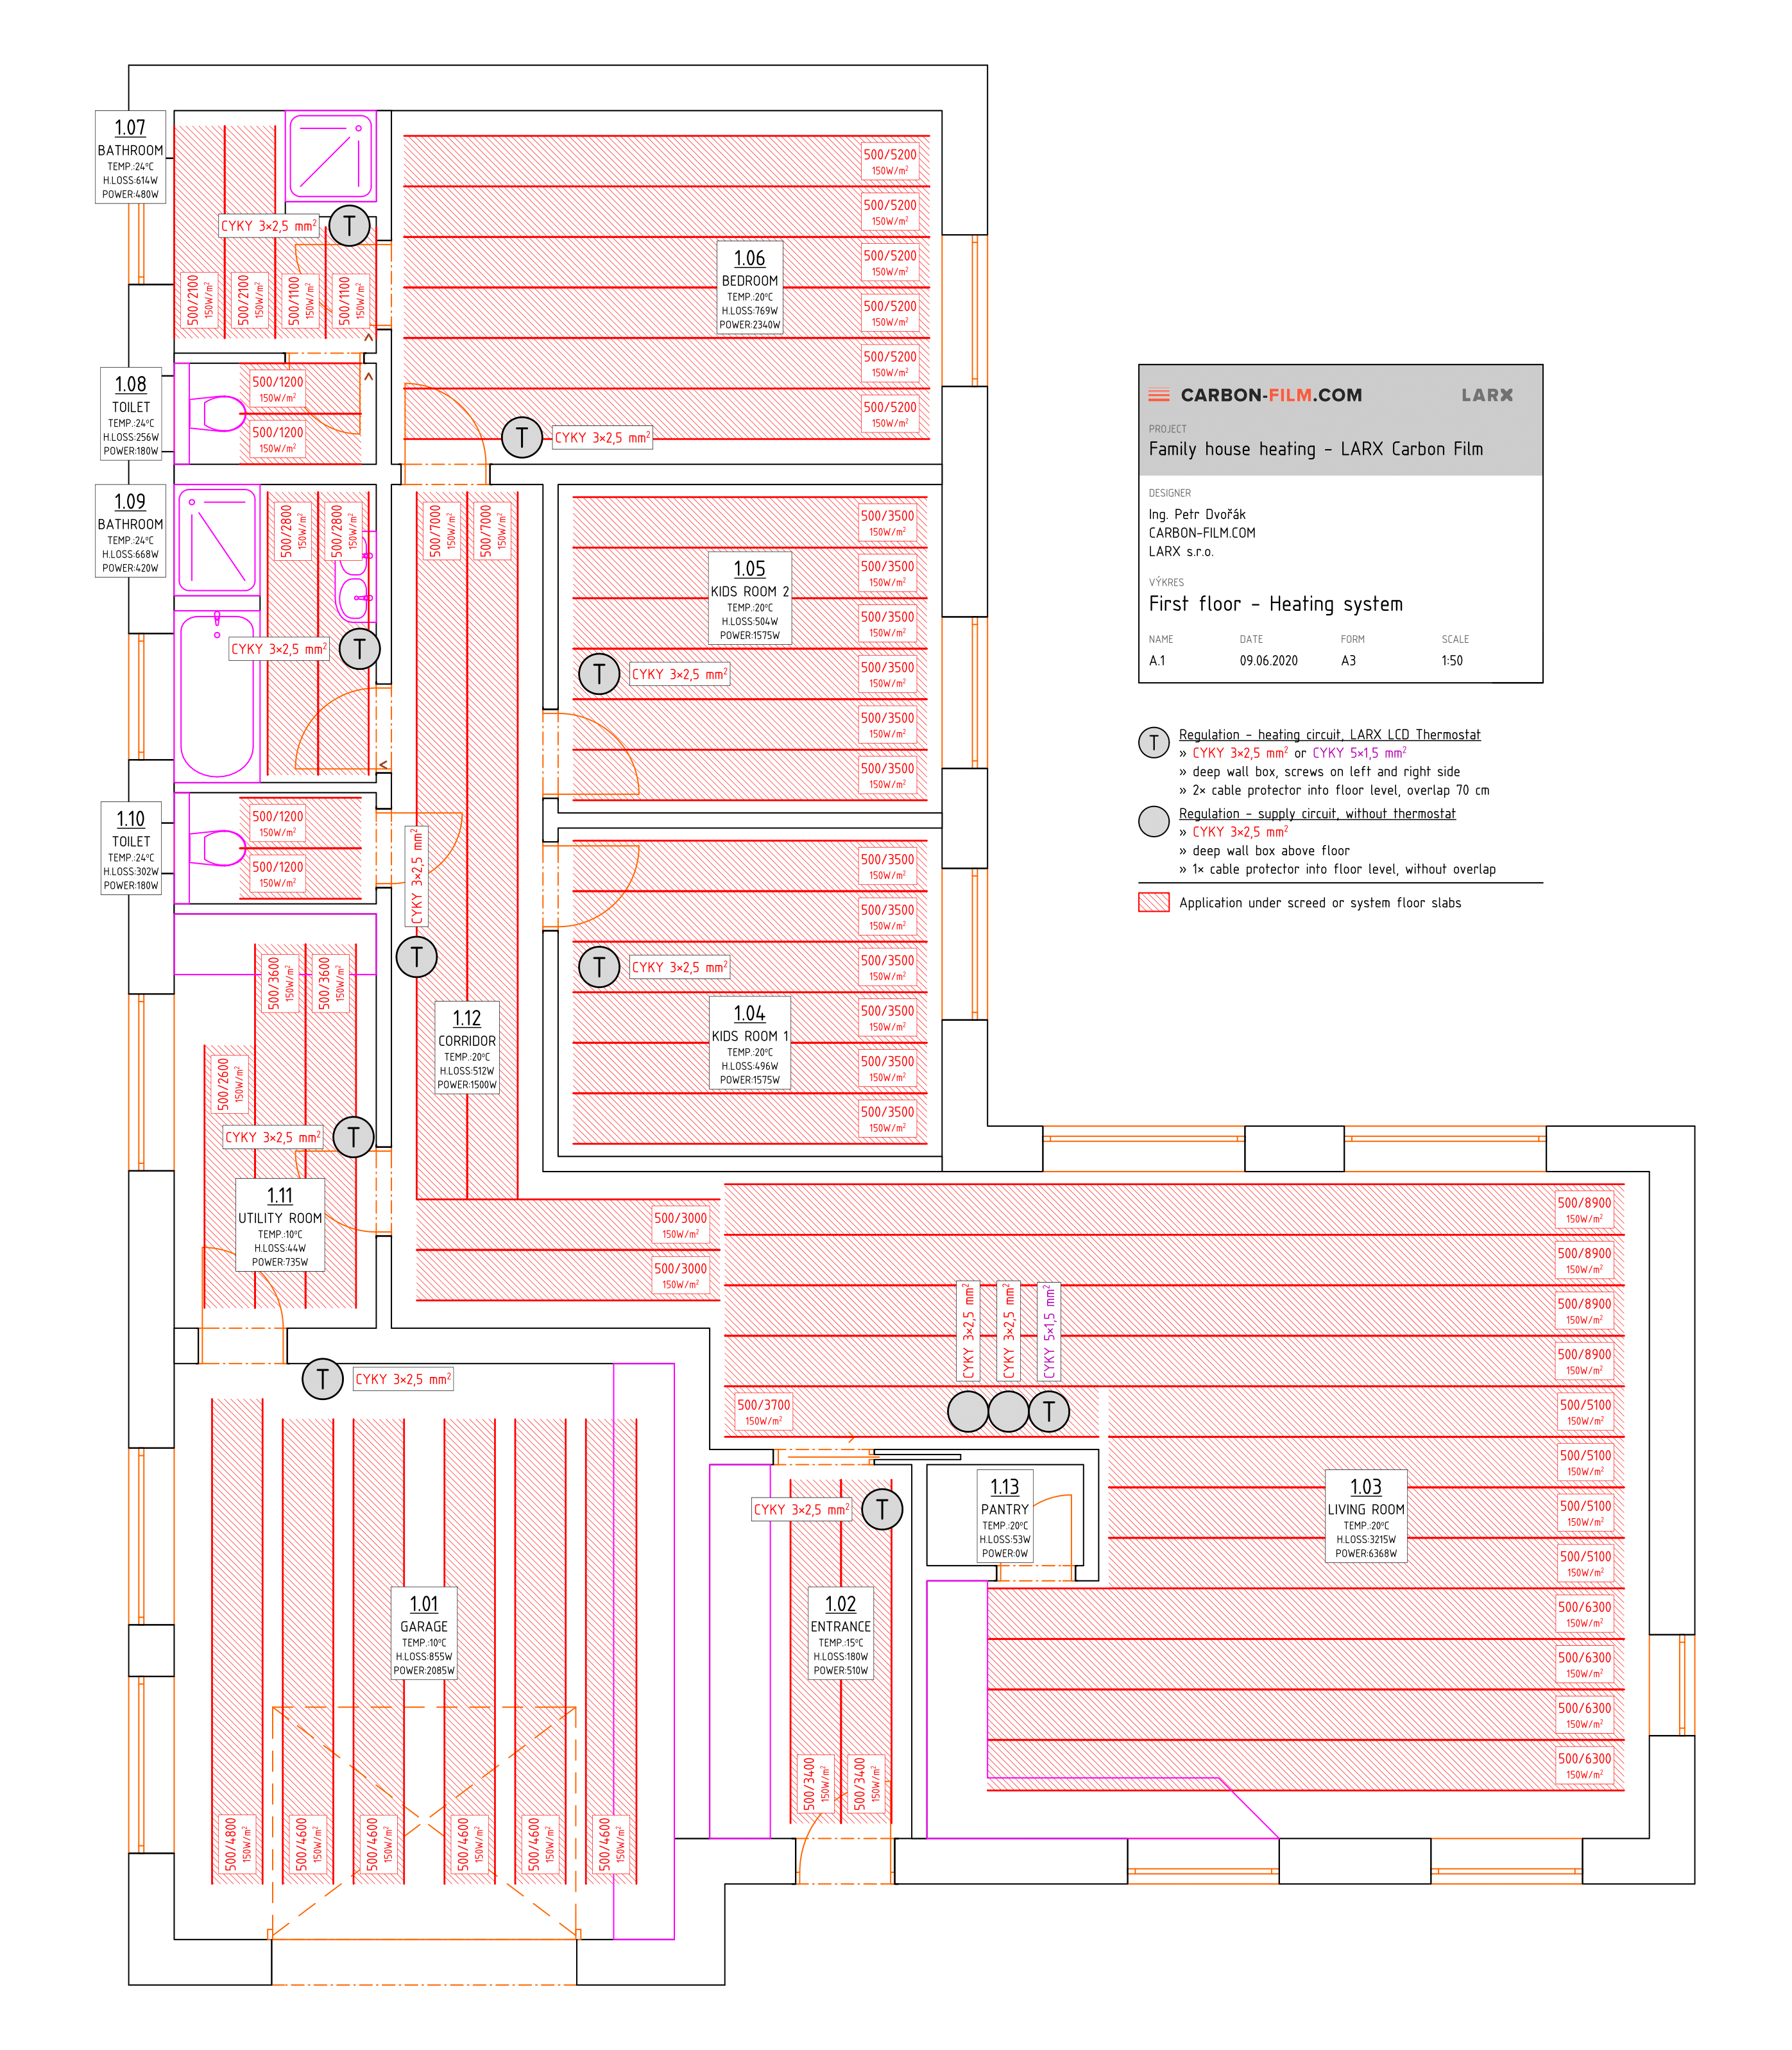 LARX CARBON-FILM.COM heating system for designers